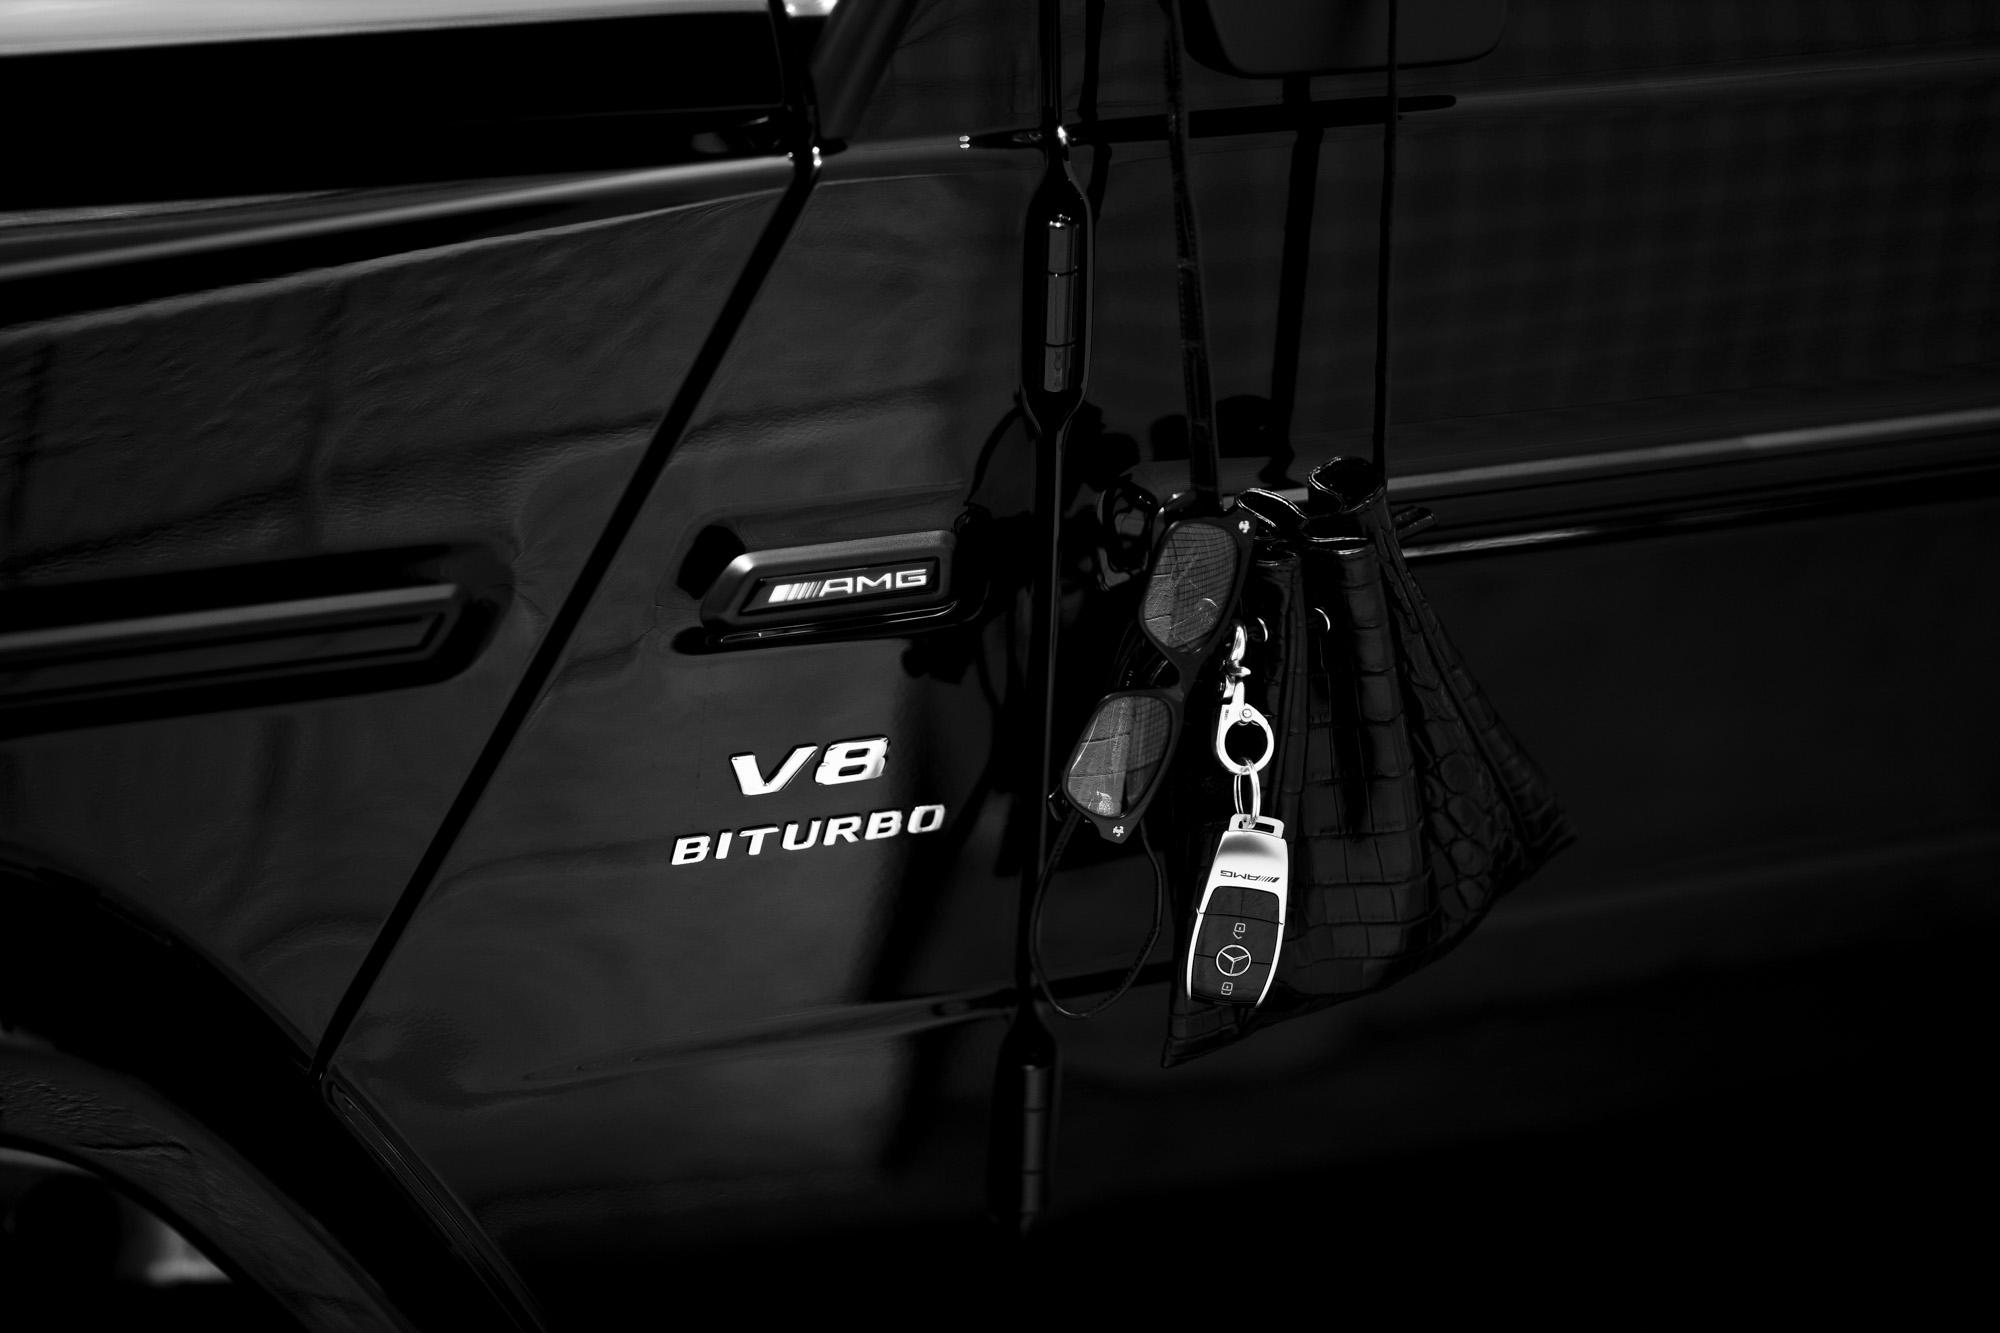 cuervo bopoha(クエルボ ヴァローナ) FLOYD(フロイド) Crocodile Leather(クロコダイルレザー) レザードローストリングバック 巾着 BLACK (ブラック) Made in Japan(日本製) 2020【Special Model】 愛知 名古屋 altoediritto アルトエデリット Mersedes benz G63 AMG G Class Gクラス